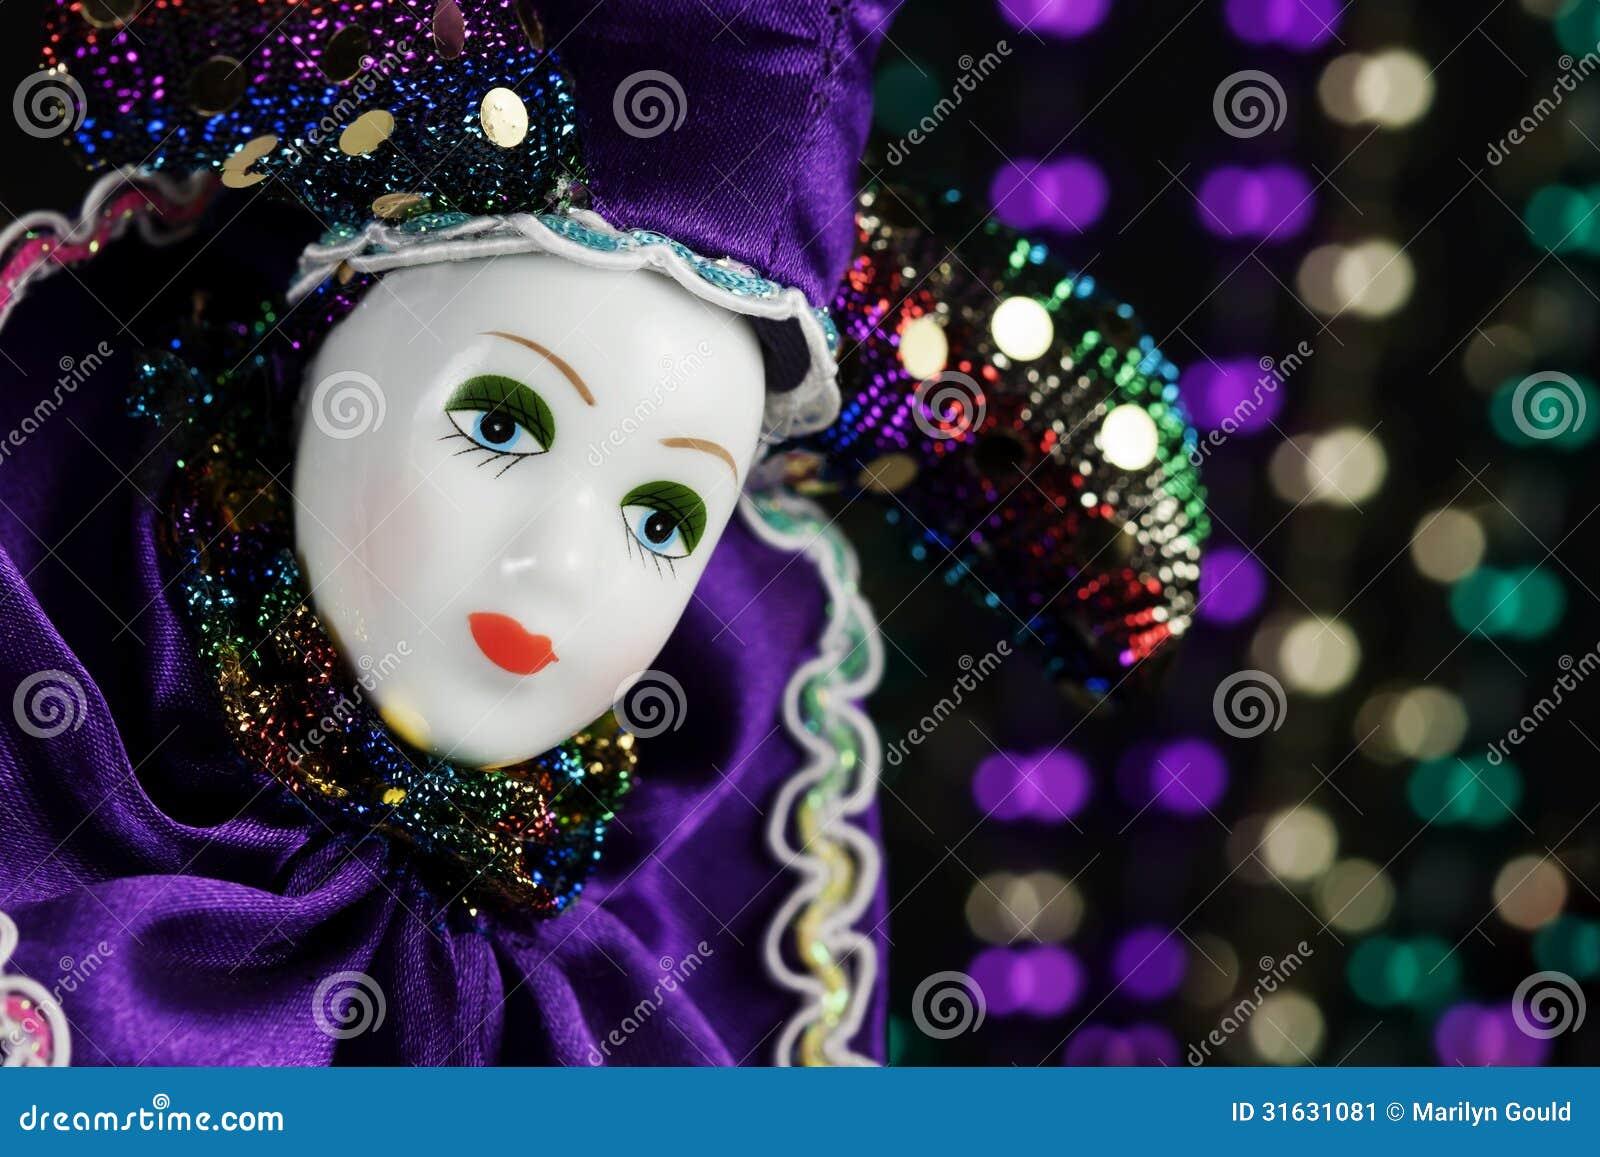 Mardi Gras Marionette Mask